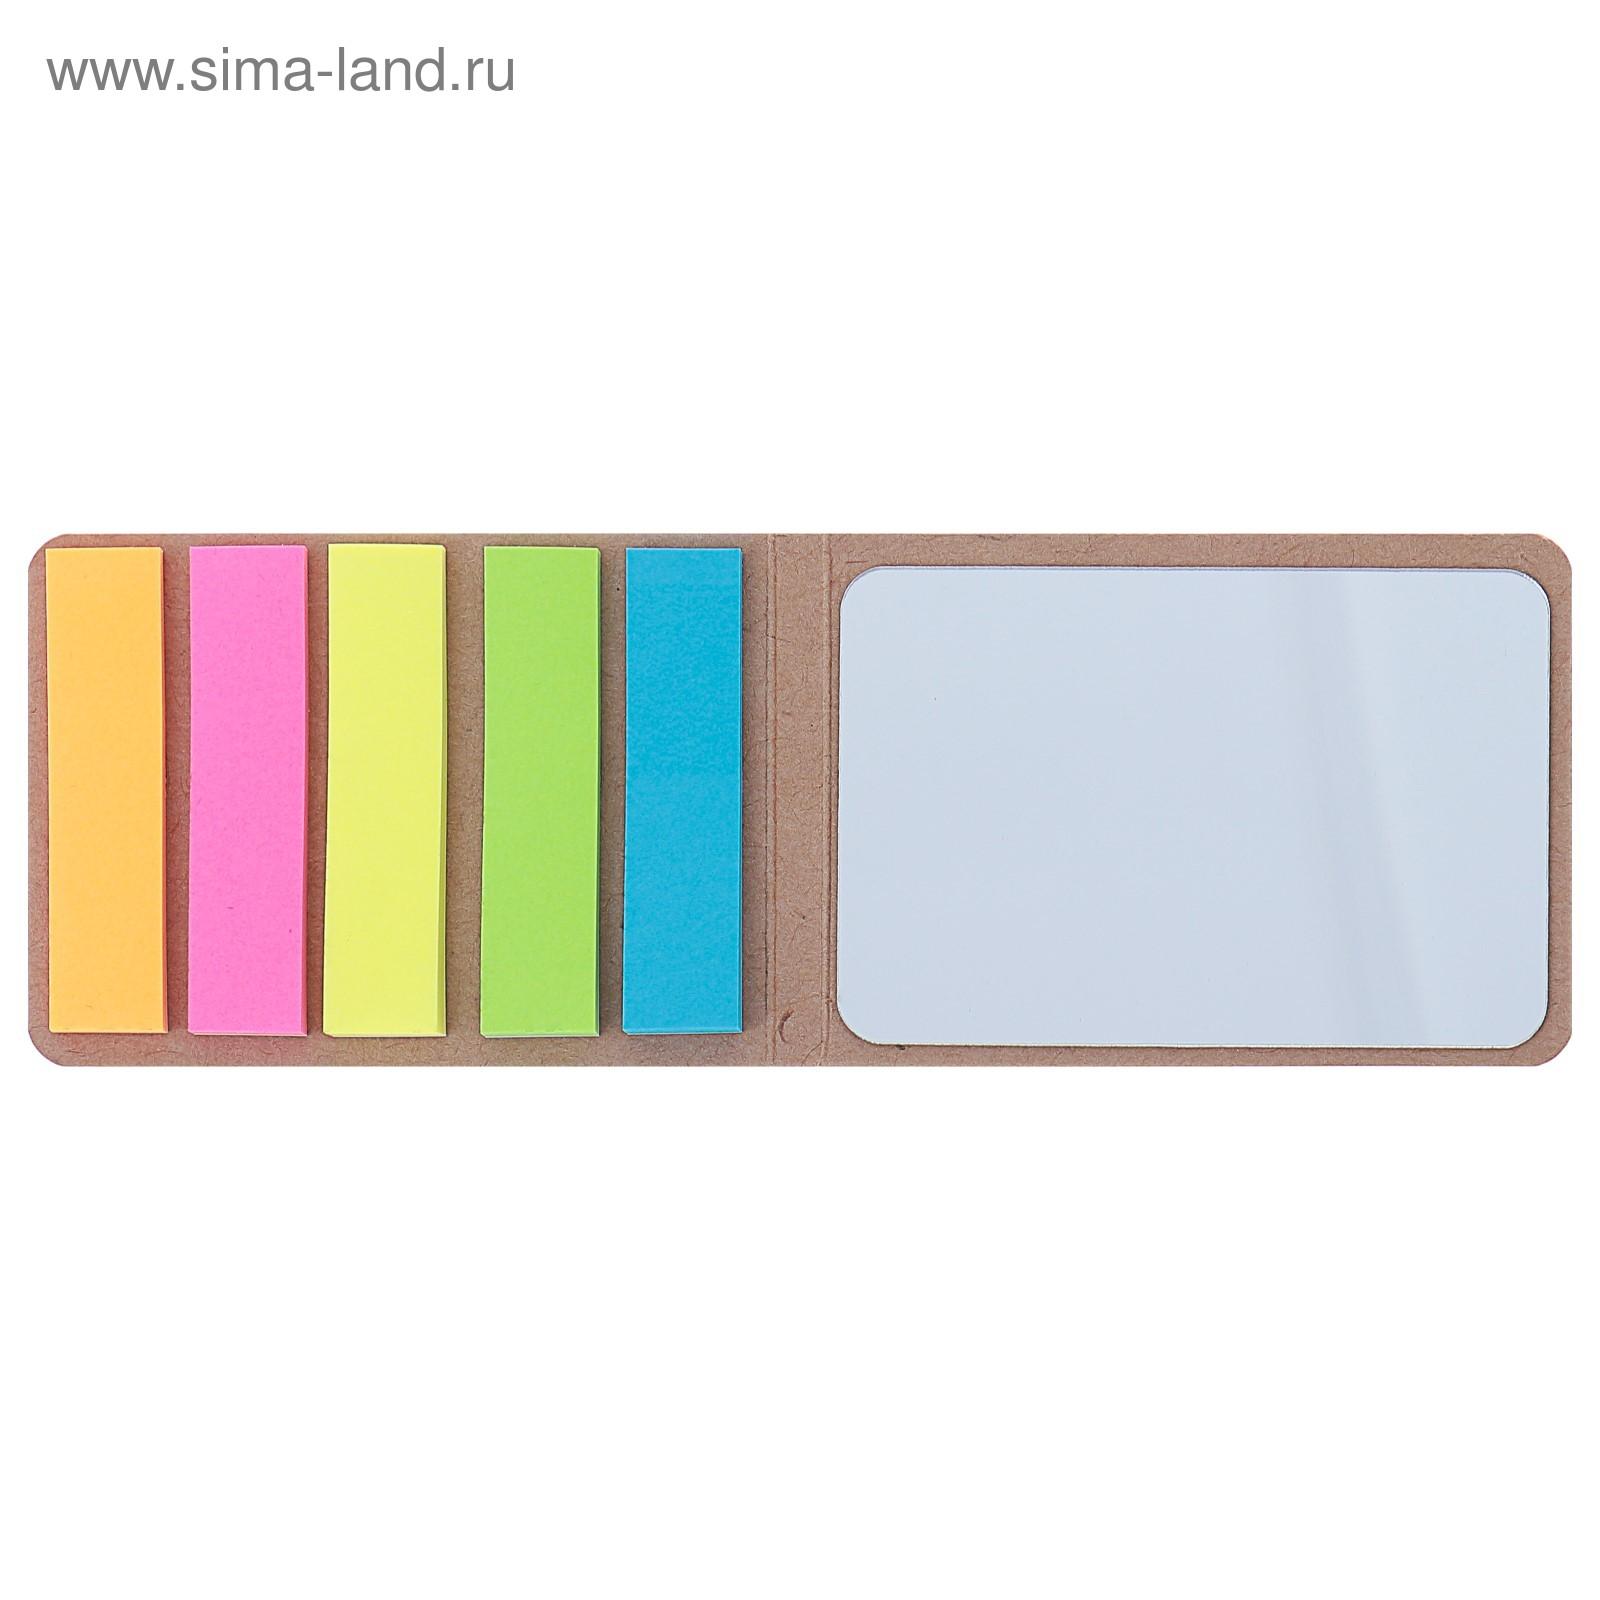 Блок липкий Закладки-разделители 5цв 25л 45*12 неон + Зеркало